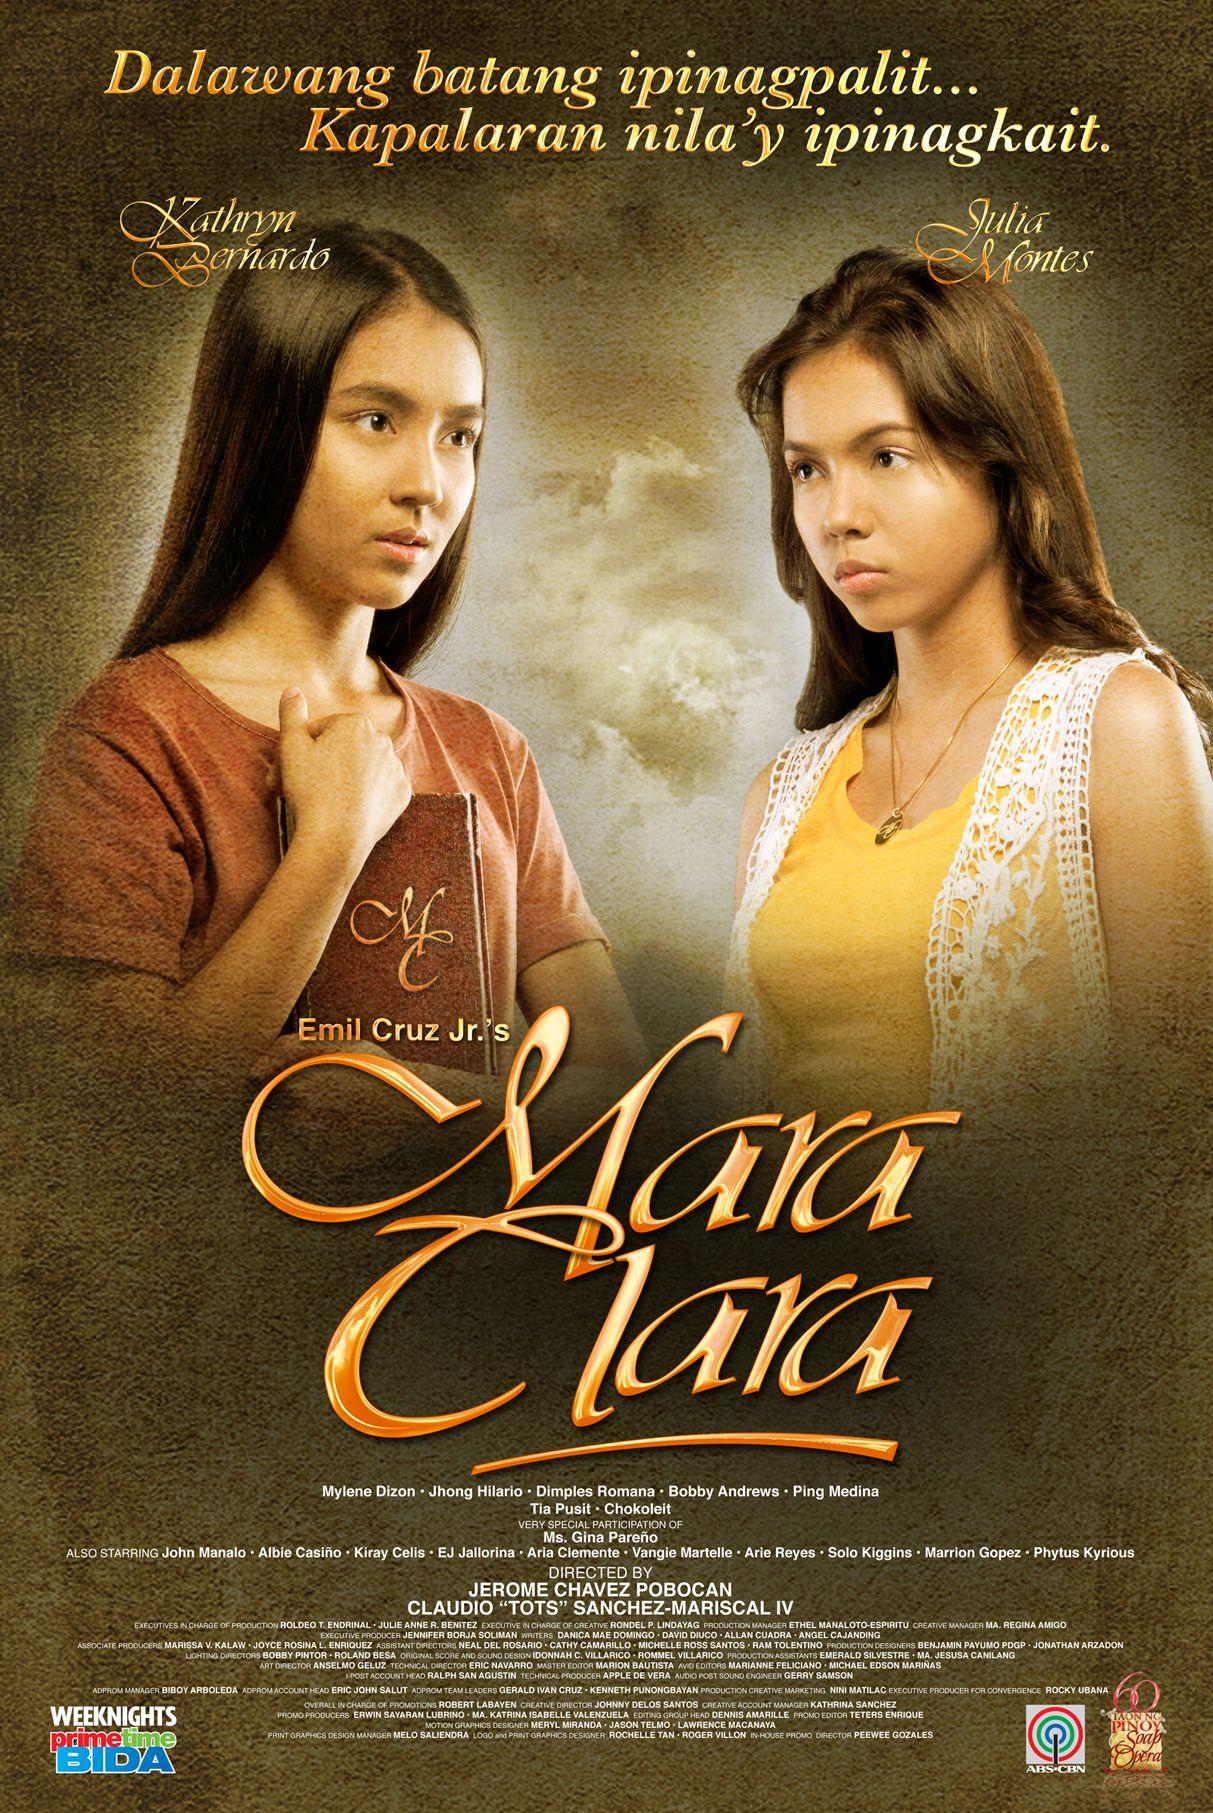 Maraclara full movies drama tv shows pinoy movies